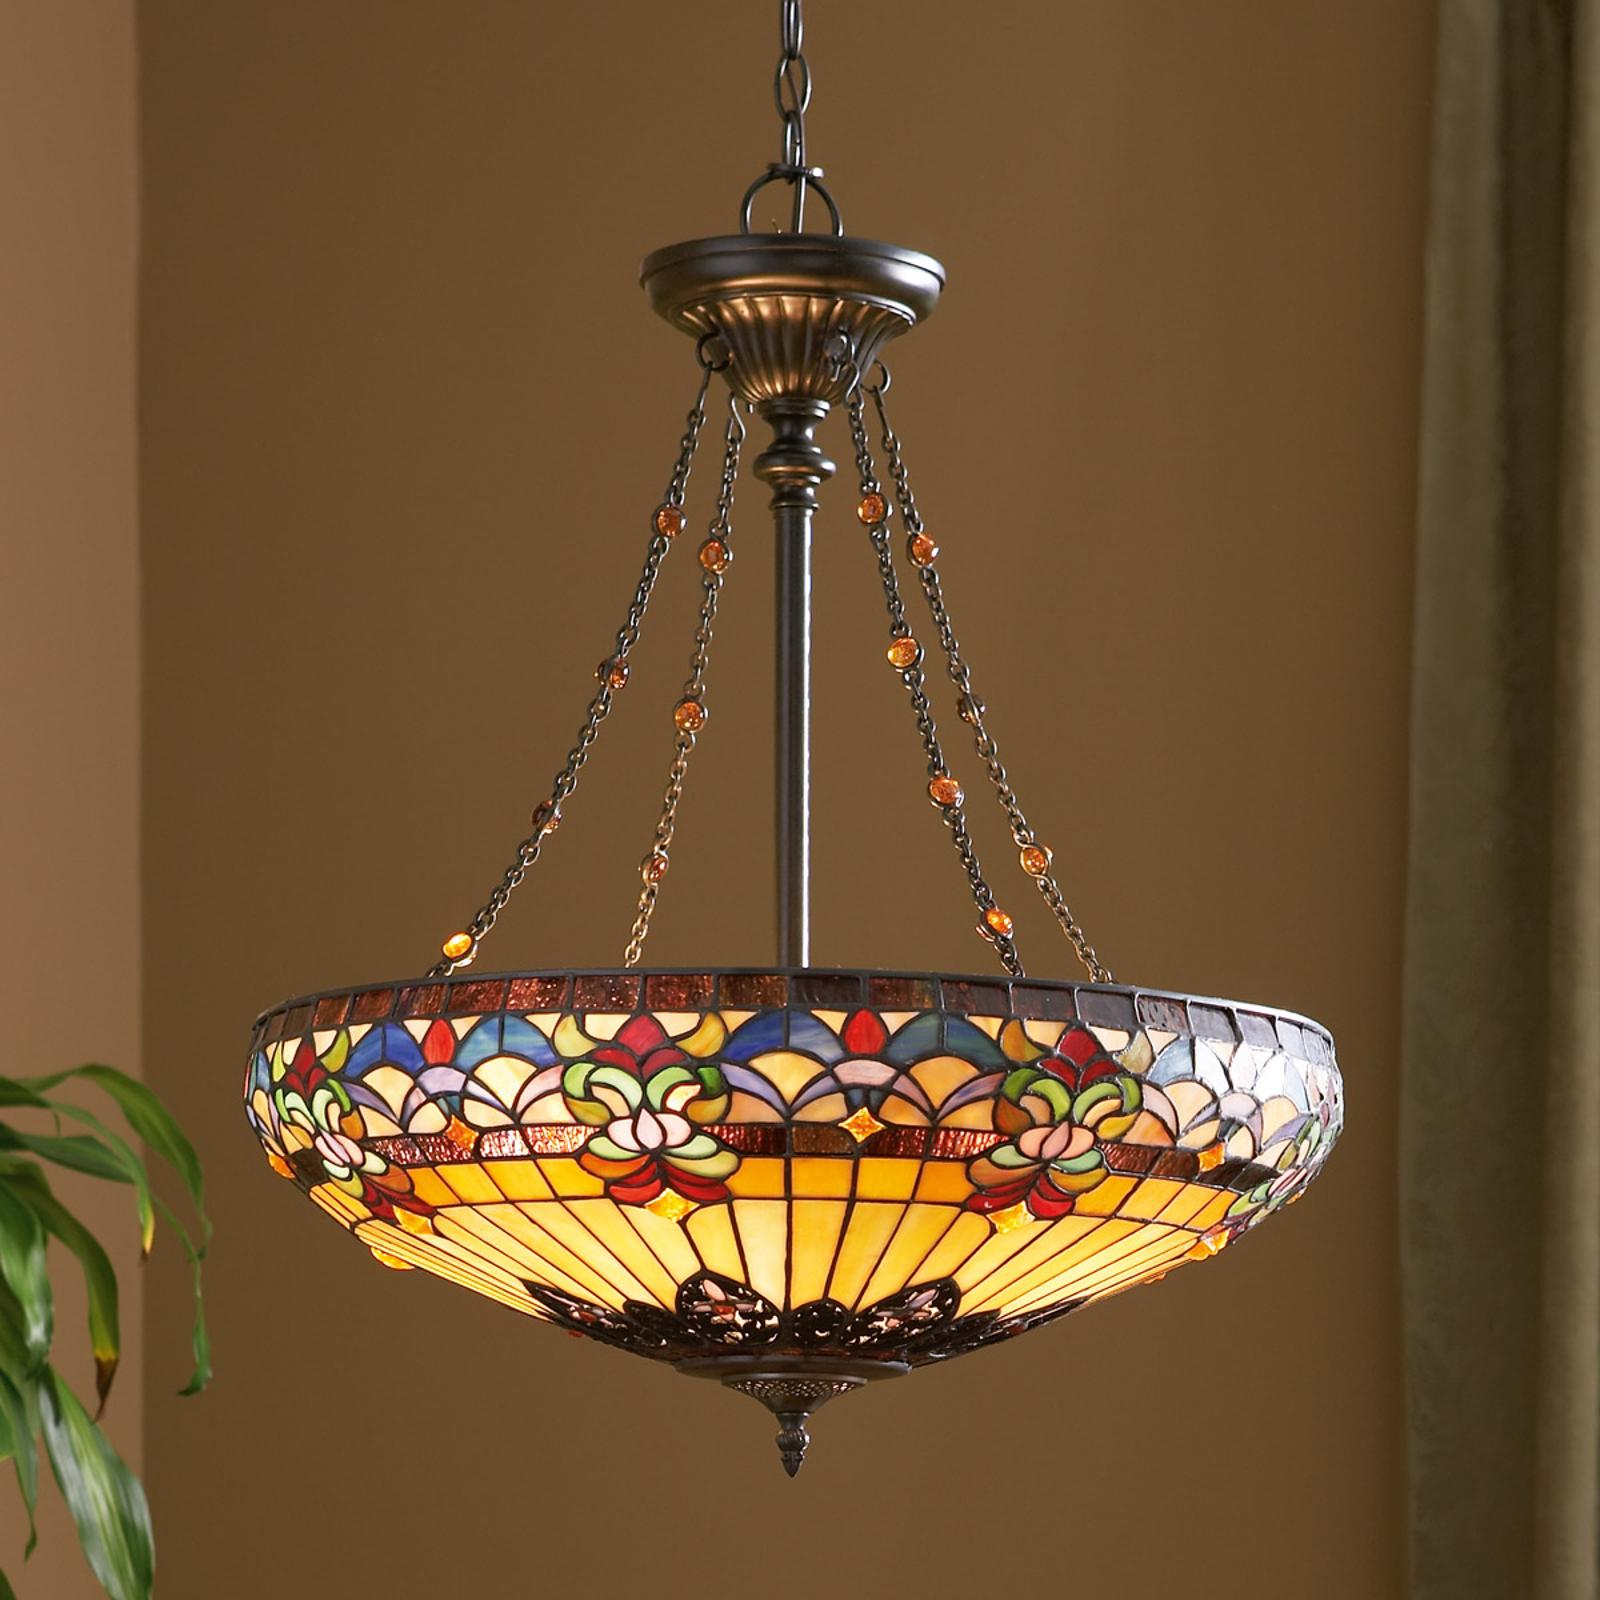 Dettagliata lampada a sospensione Belle Fleur